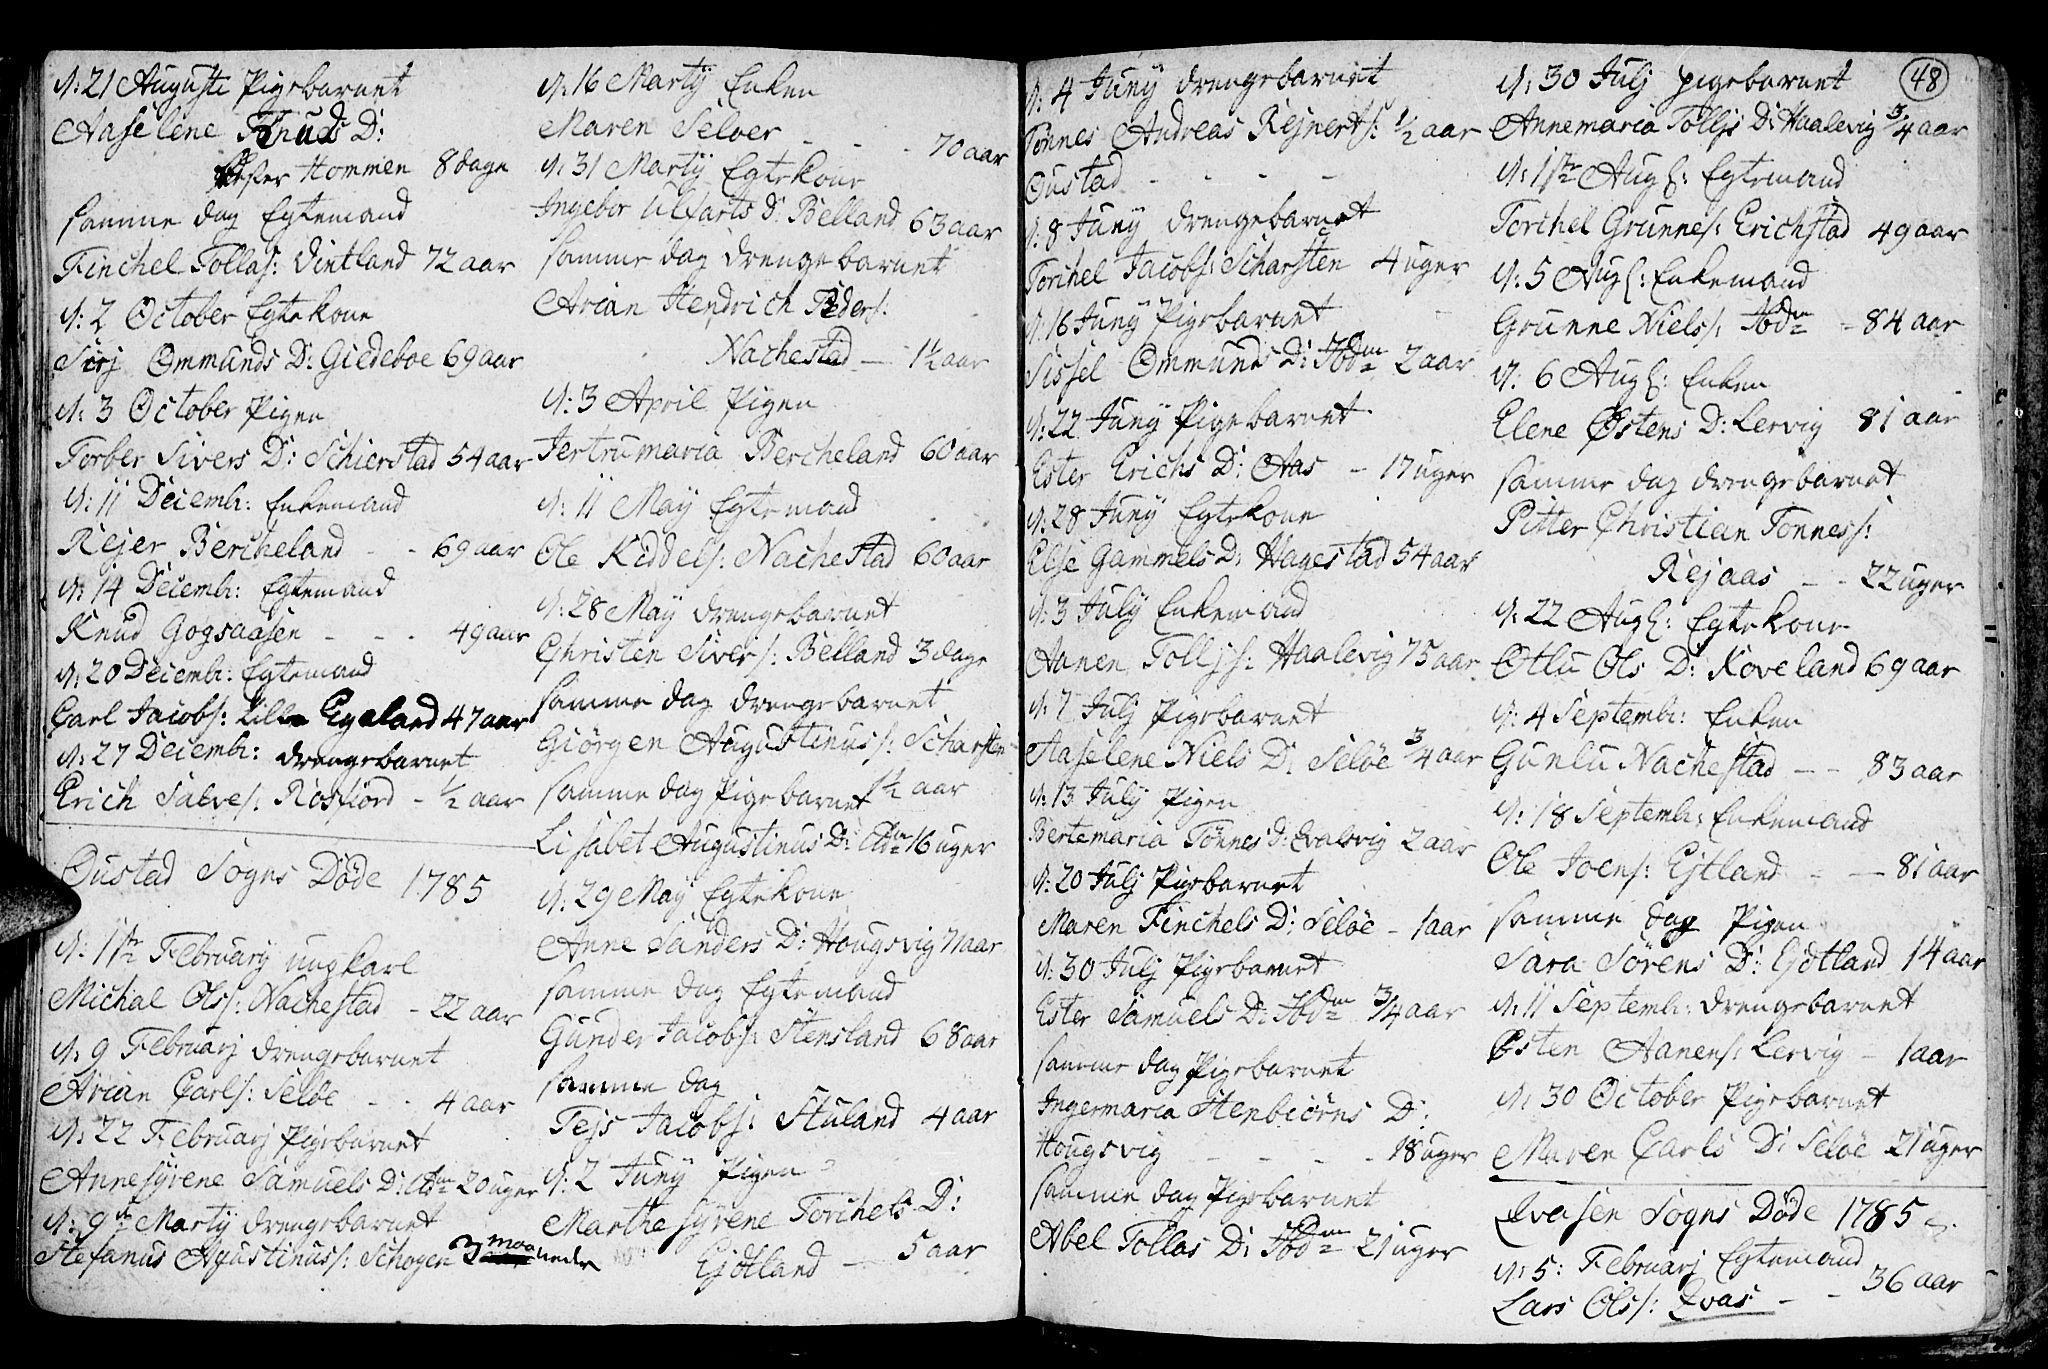 SAK, Lyngdal sokneprestkontor, F/Fa/Fac/L0003: Ministerialbok nr. A 3, 1750-1803, s. 48